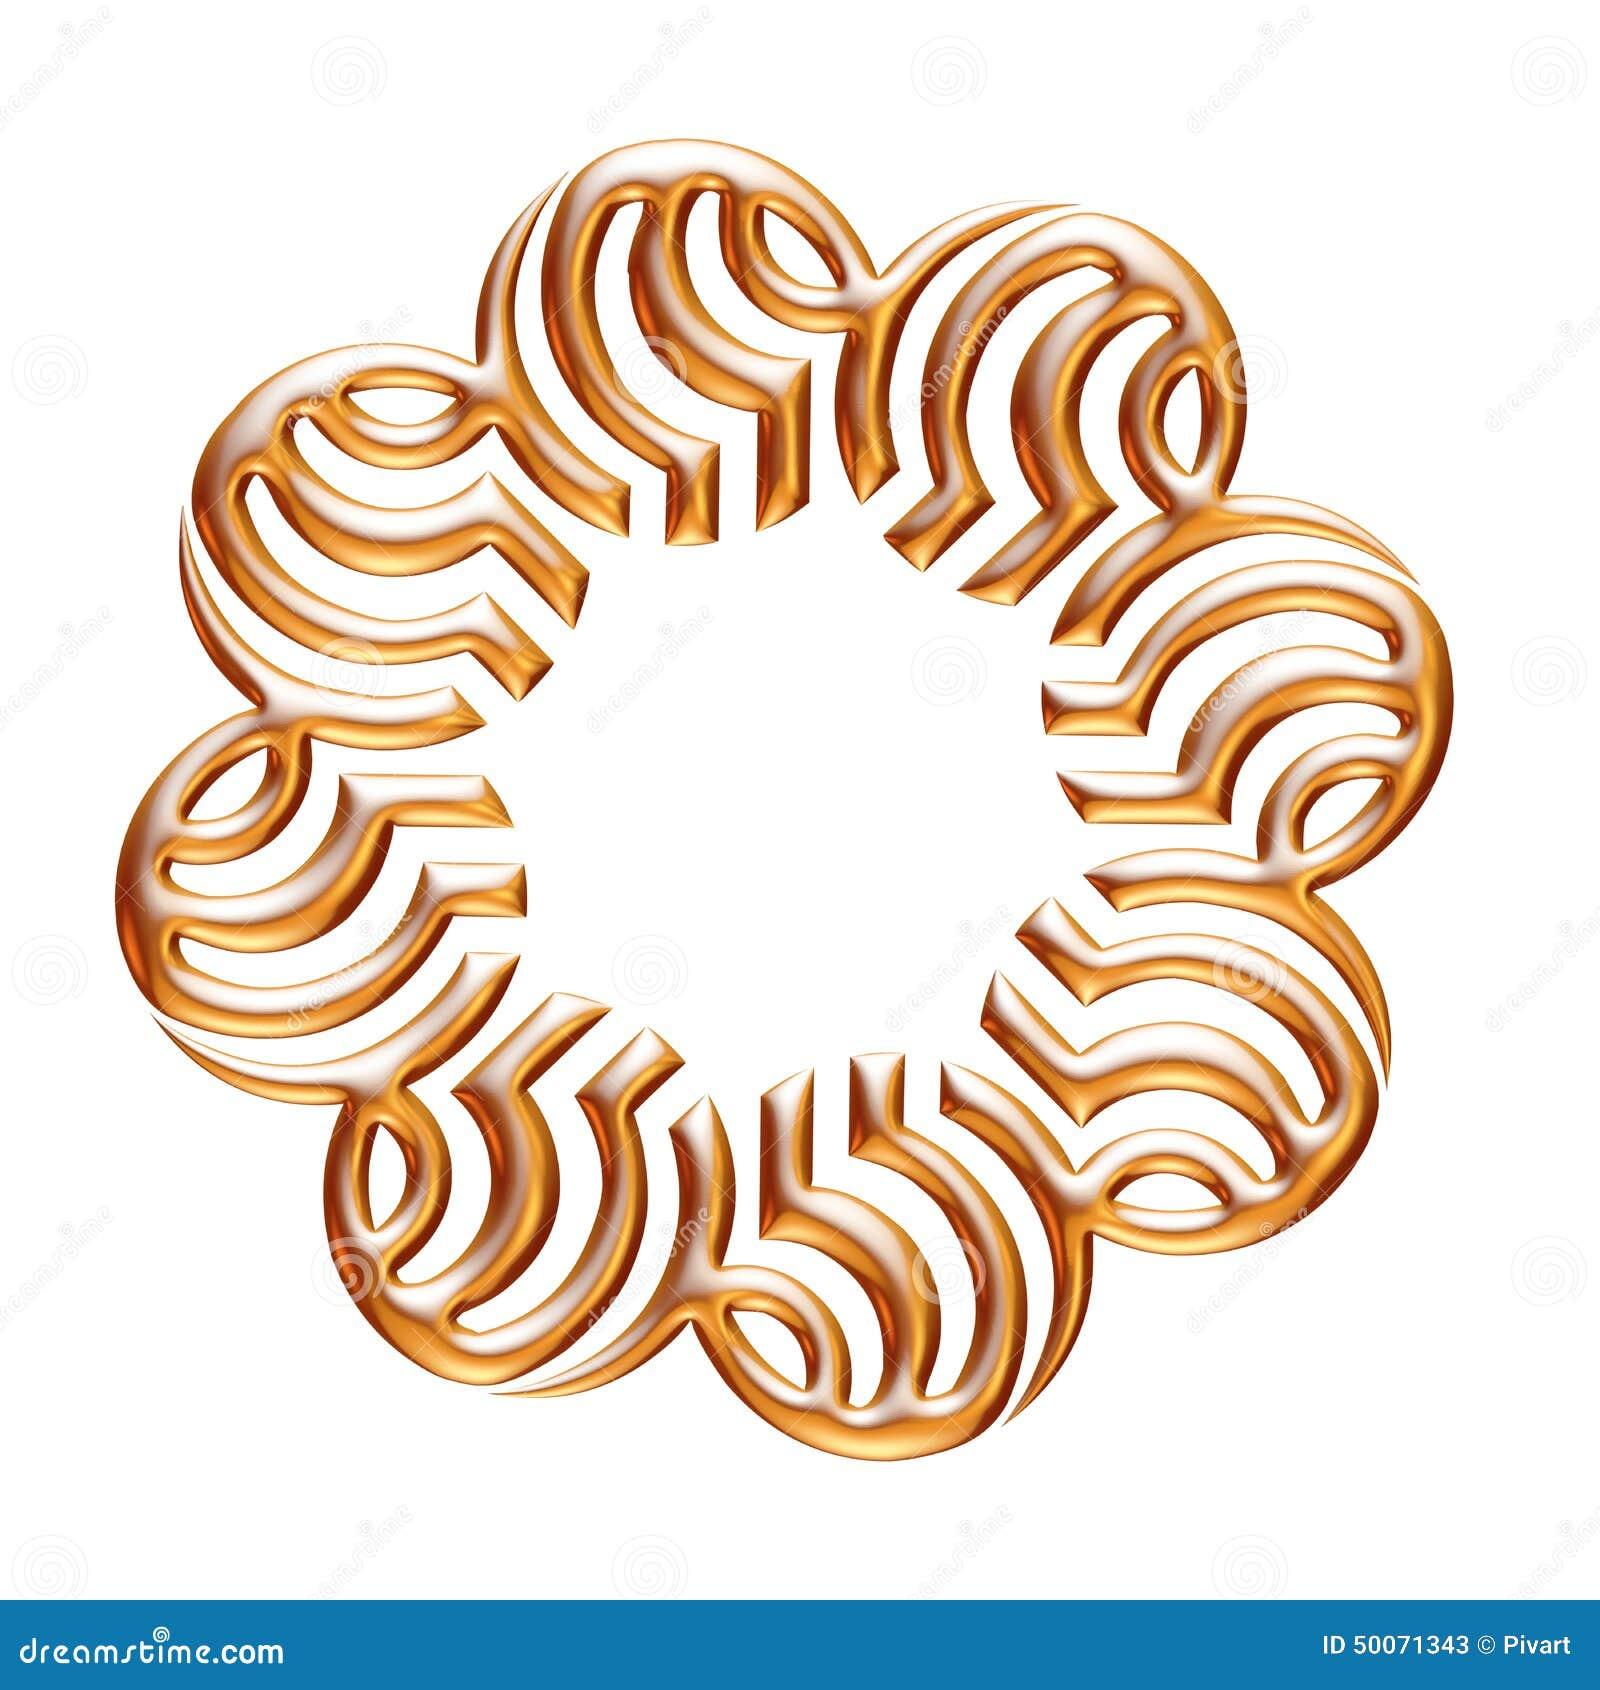 Obama's Wedding Ring